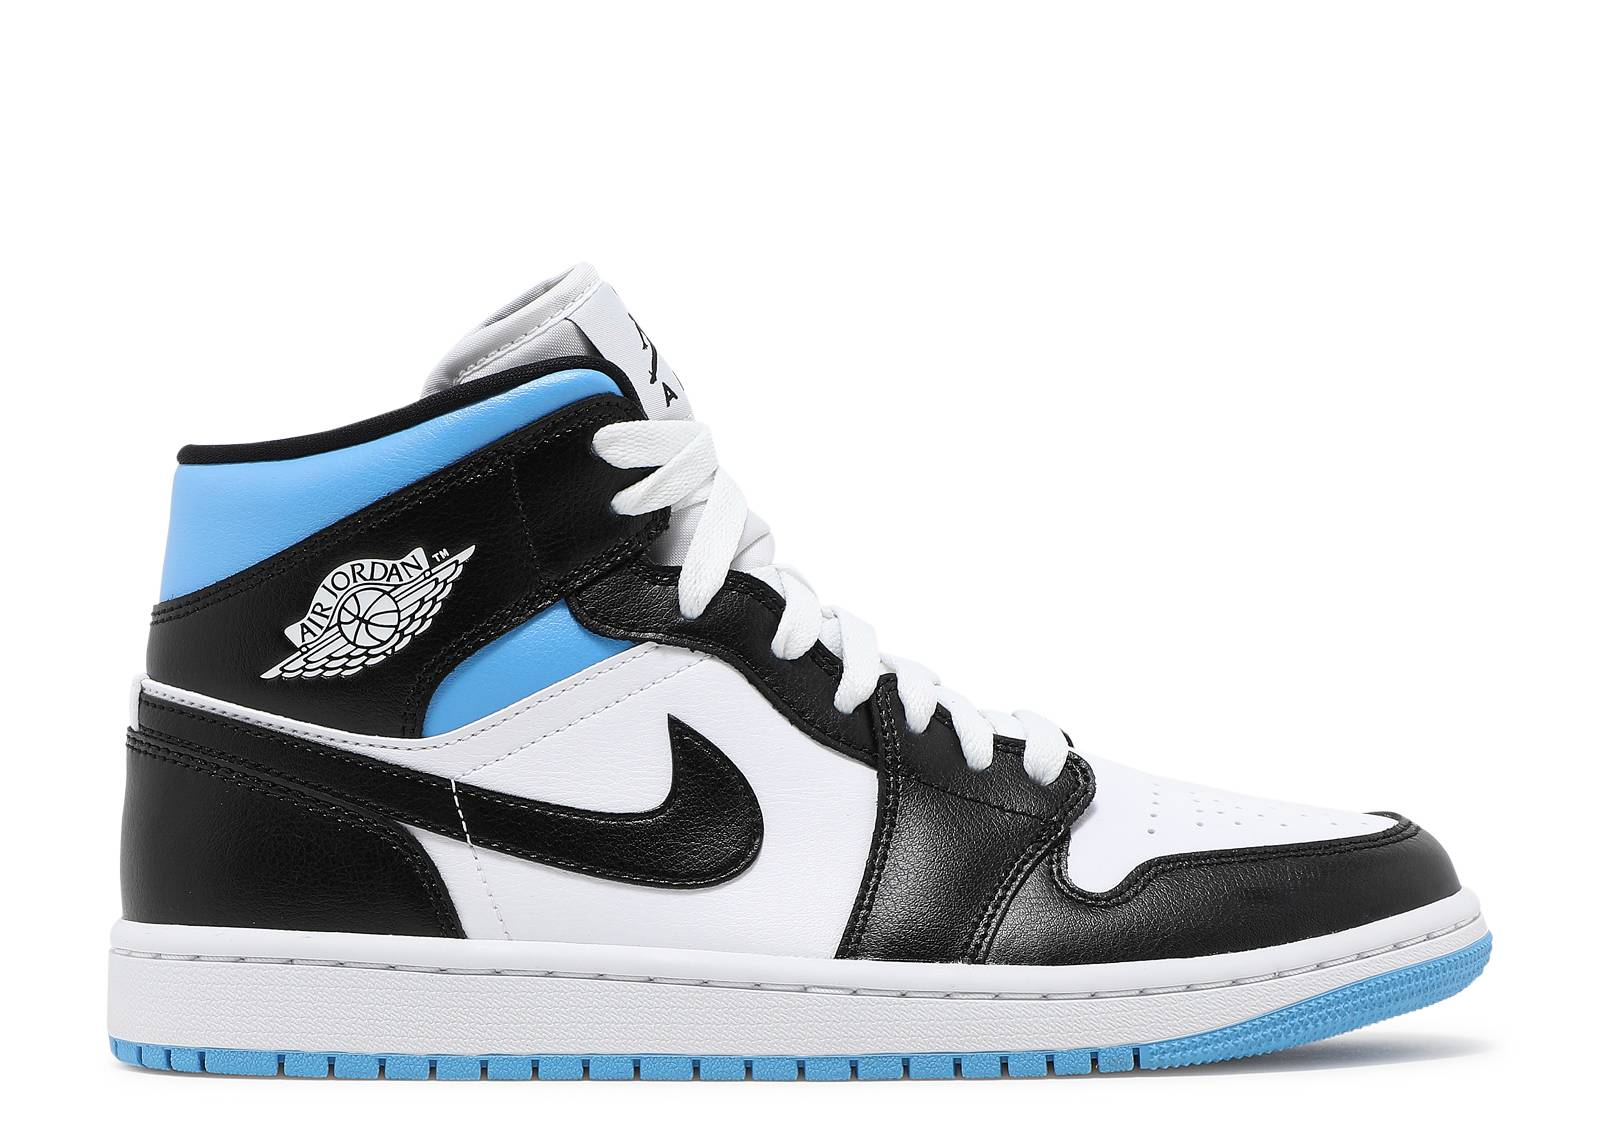 Mid Top Air Jordan Sneakers | Flight Club